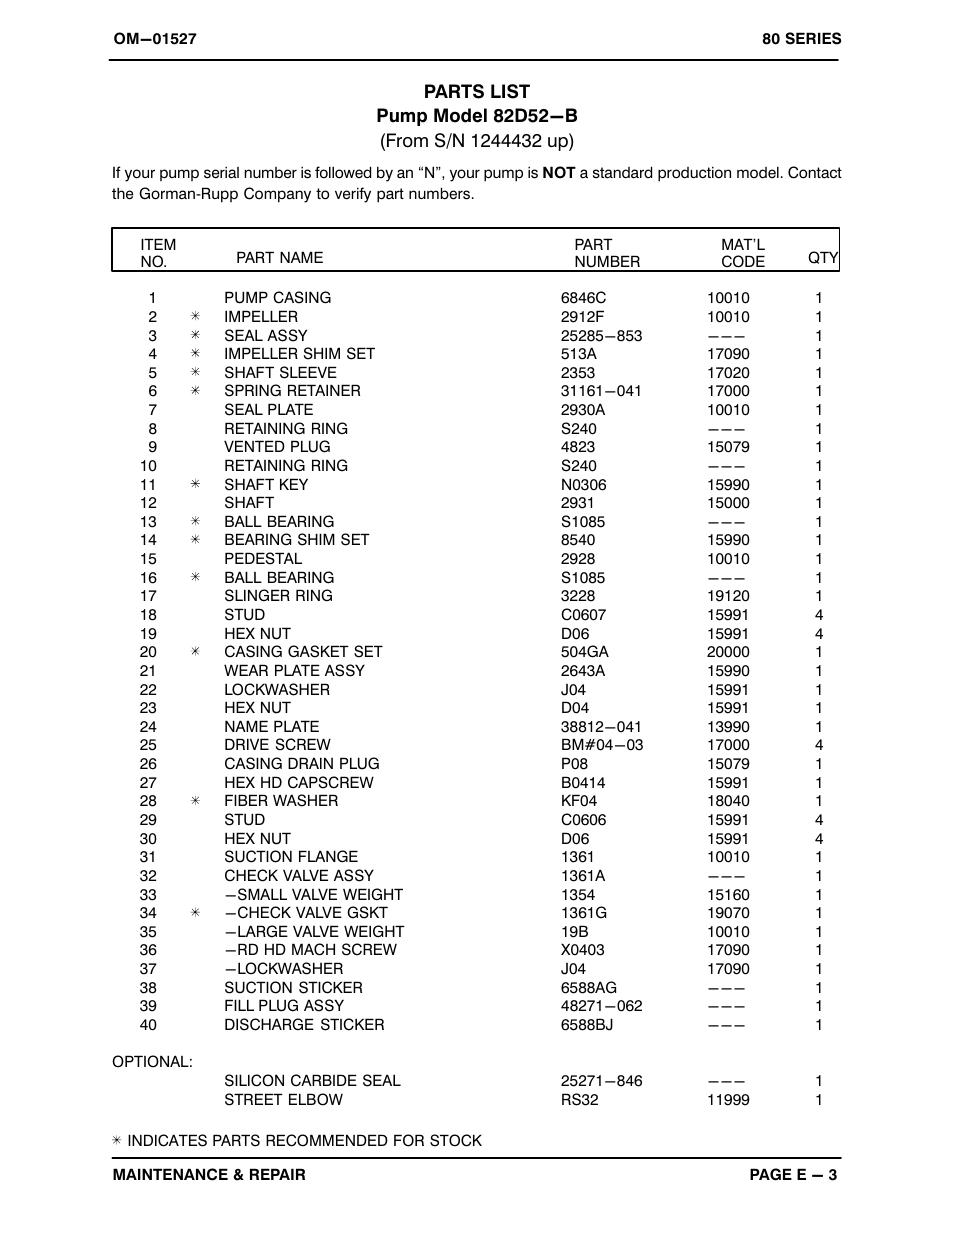 Gorman-Rupp Pumps 82D52-B 1244432 and up User Manual